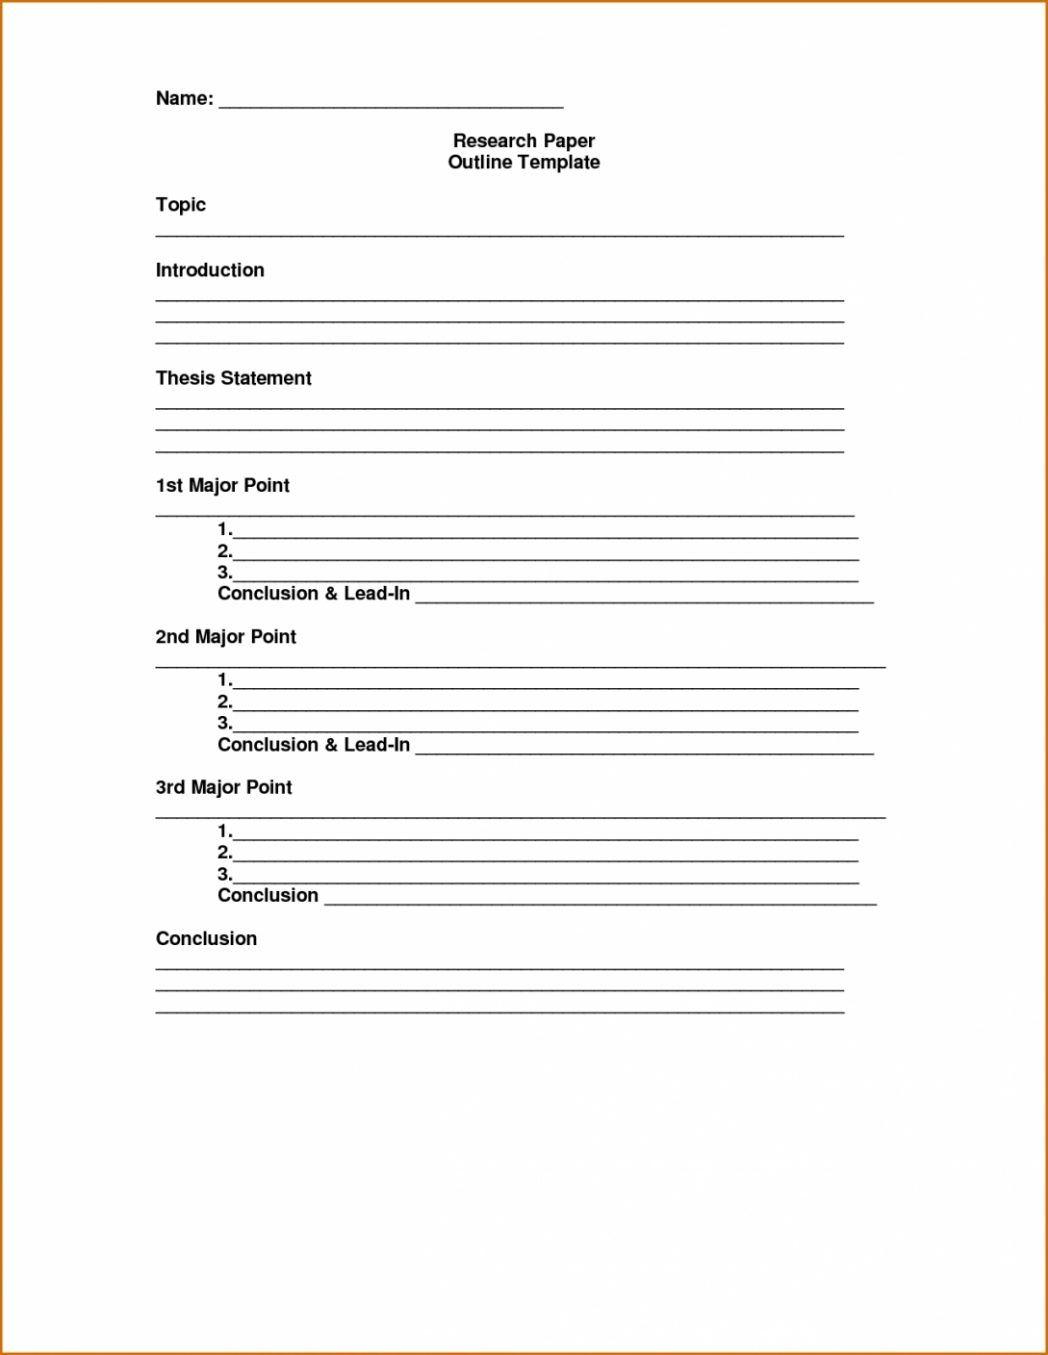 Effortless Research Paper Outline Worksheet You Never Seen